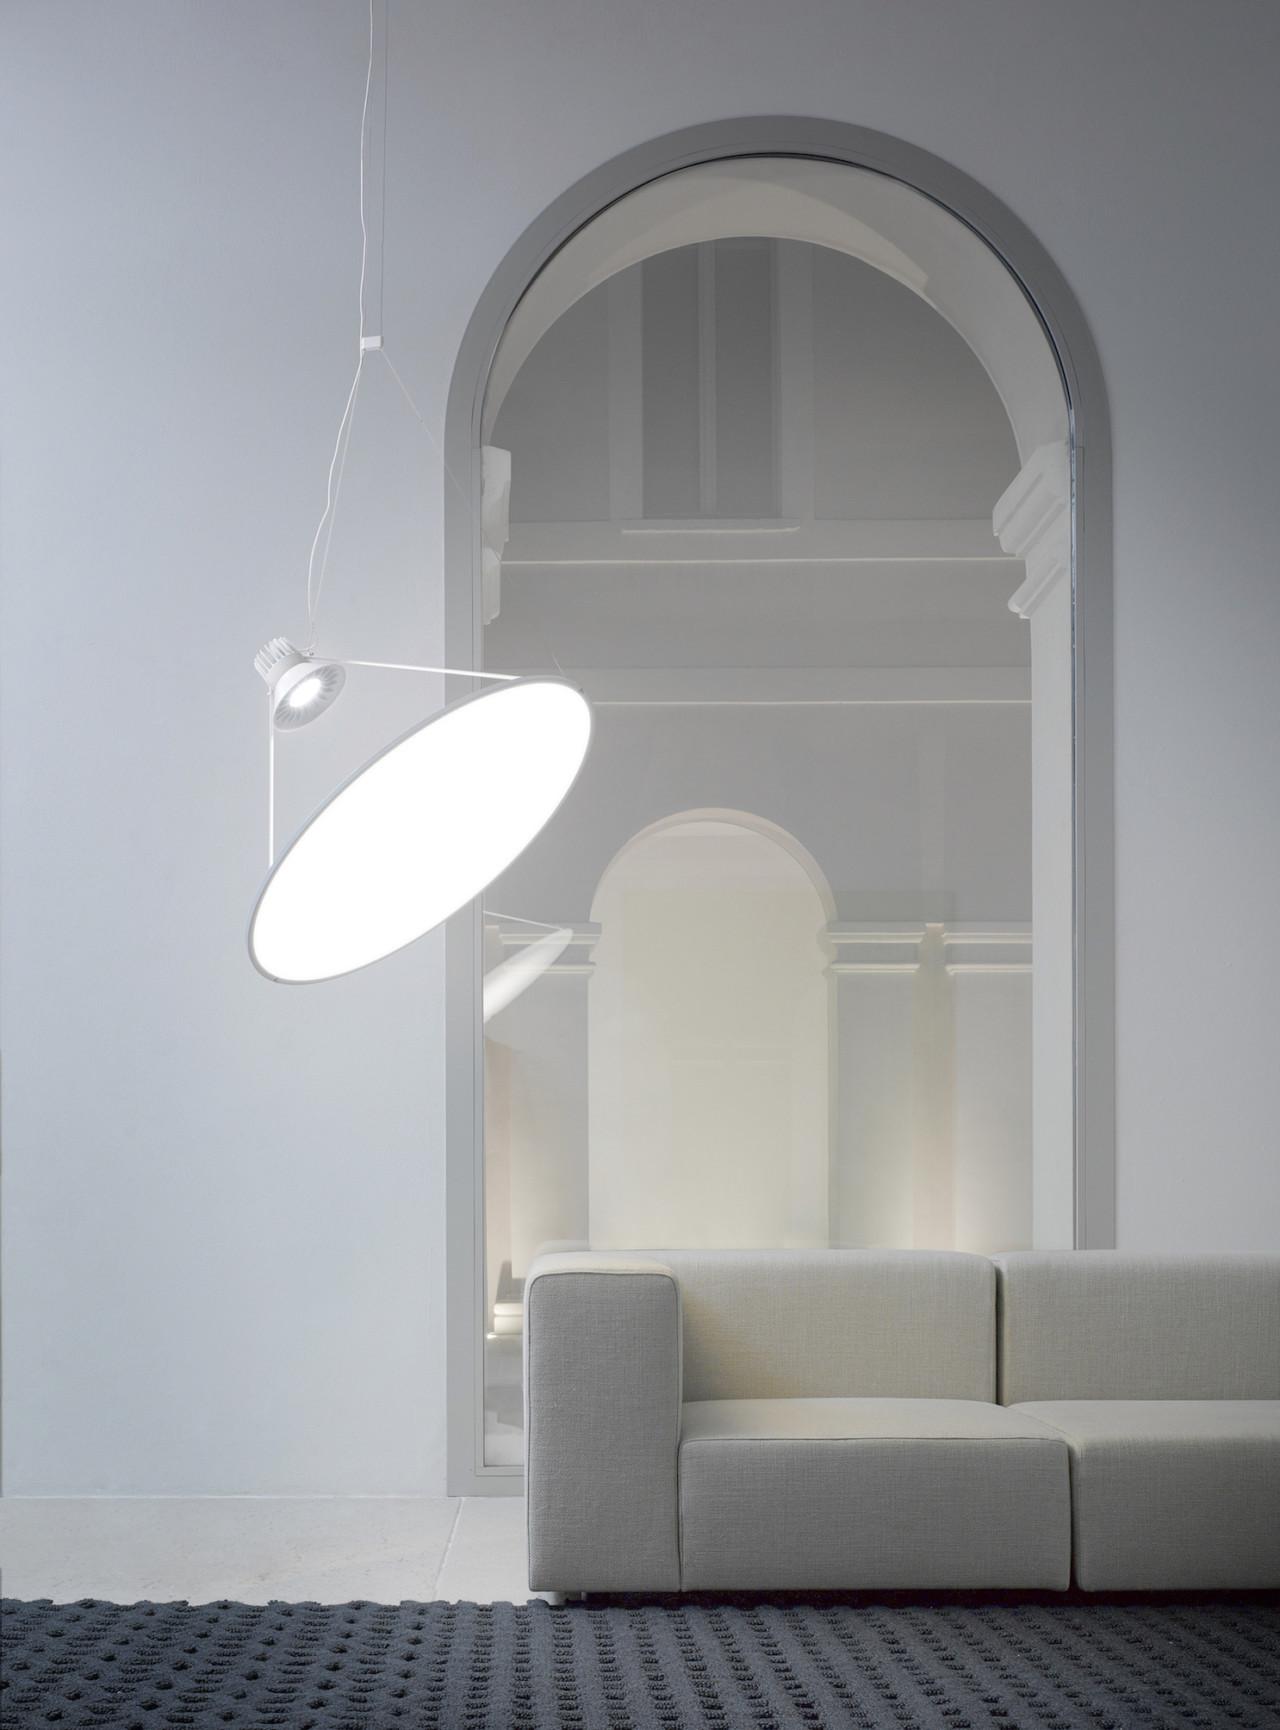 đèn treo amisol 4